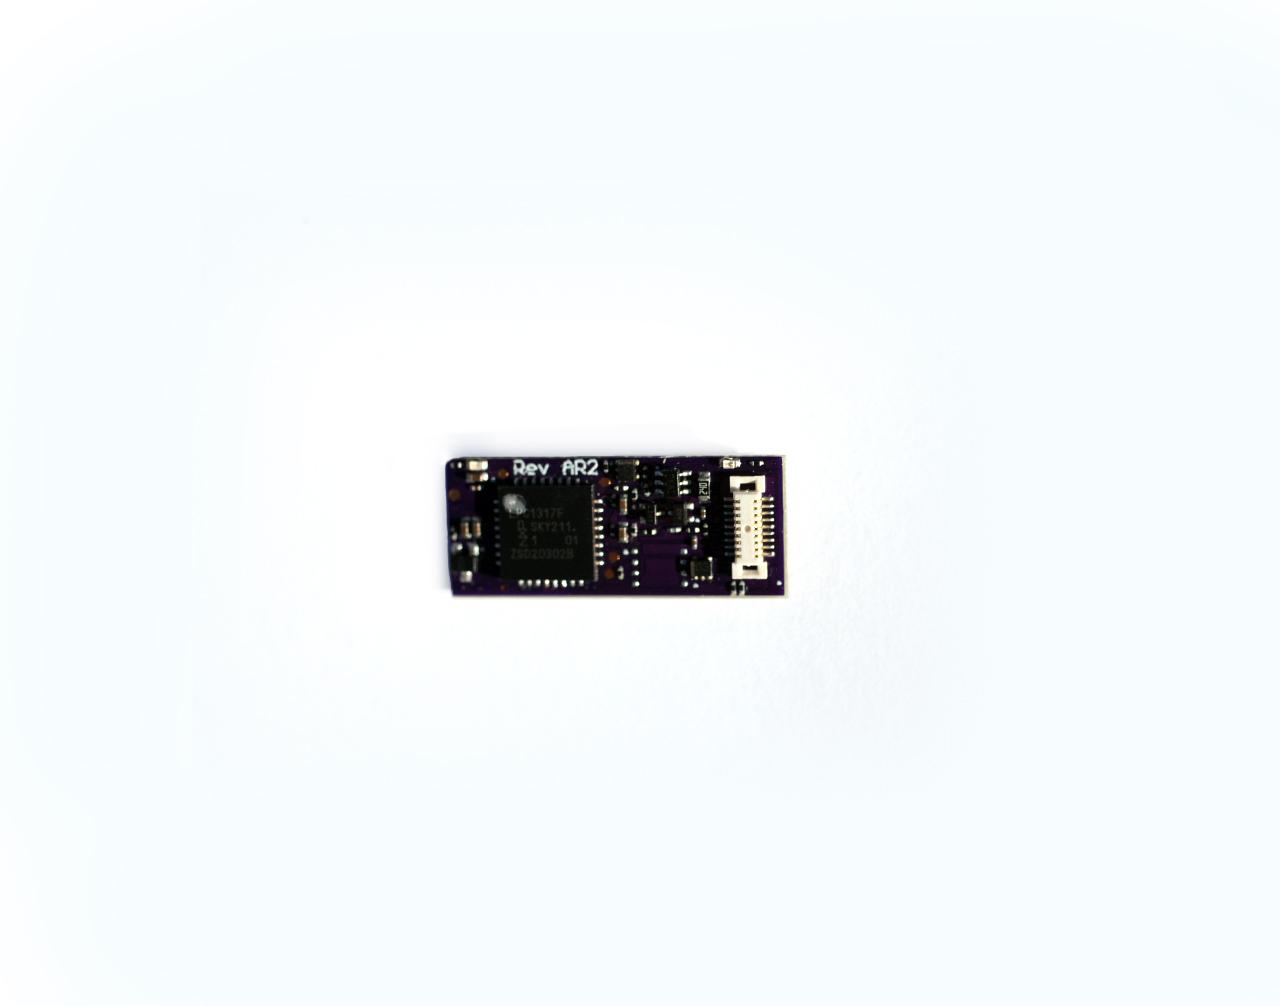 Soundtraxx 885029 - HO & N Scale TSU-N18 Tsunami2 Sound Decoder for Baldwin & Other Diesels